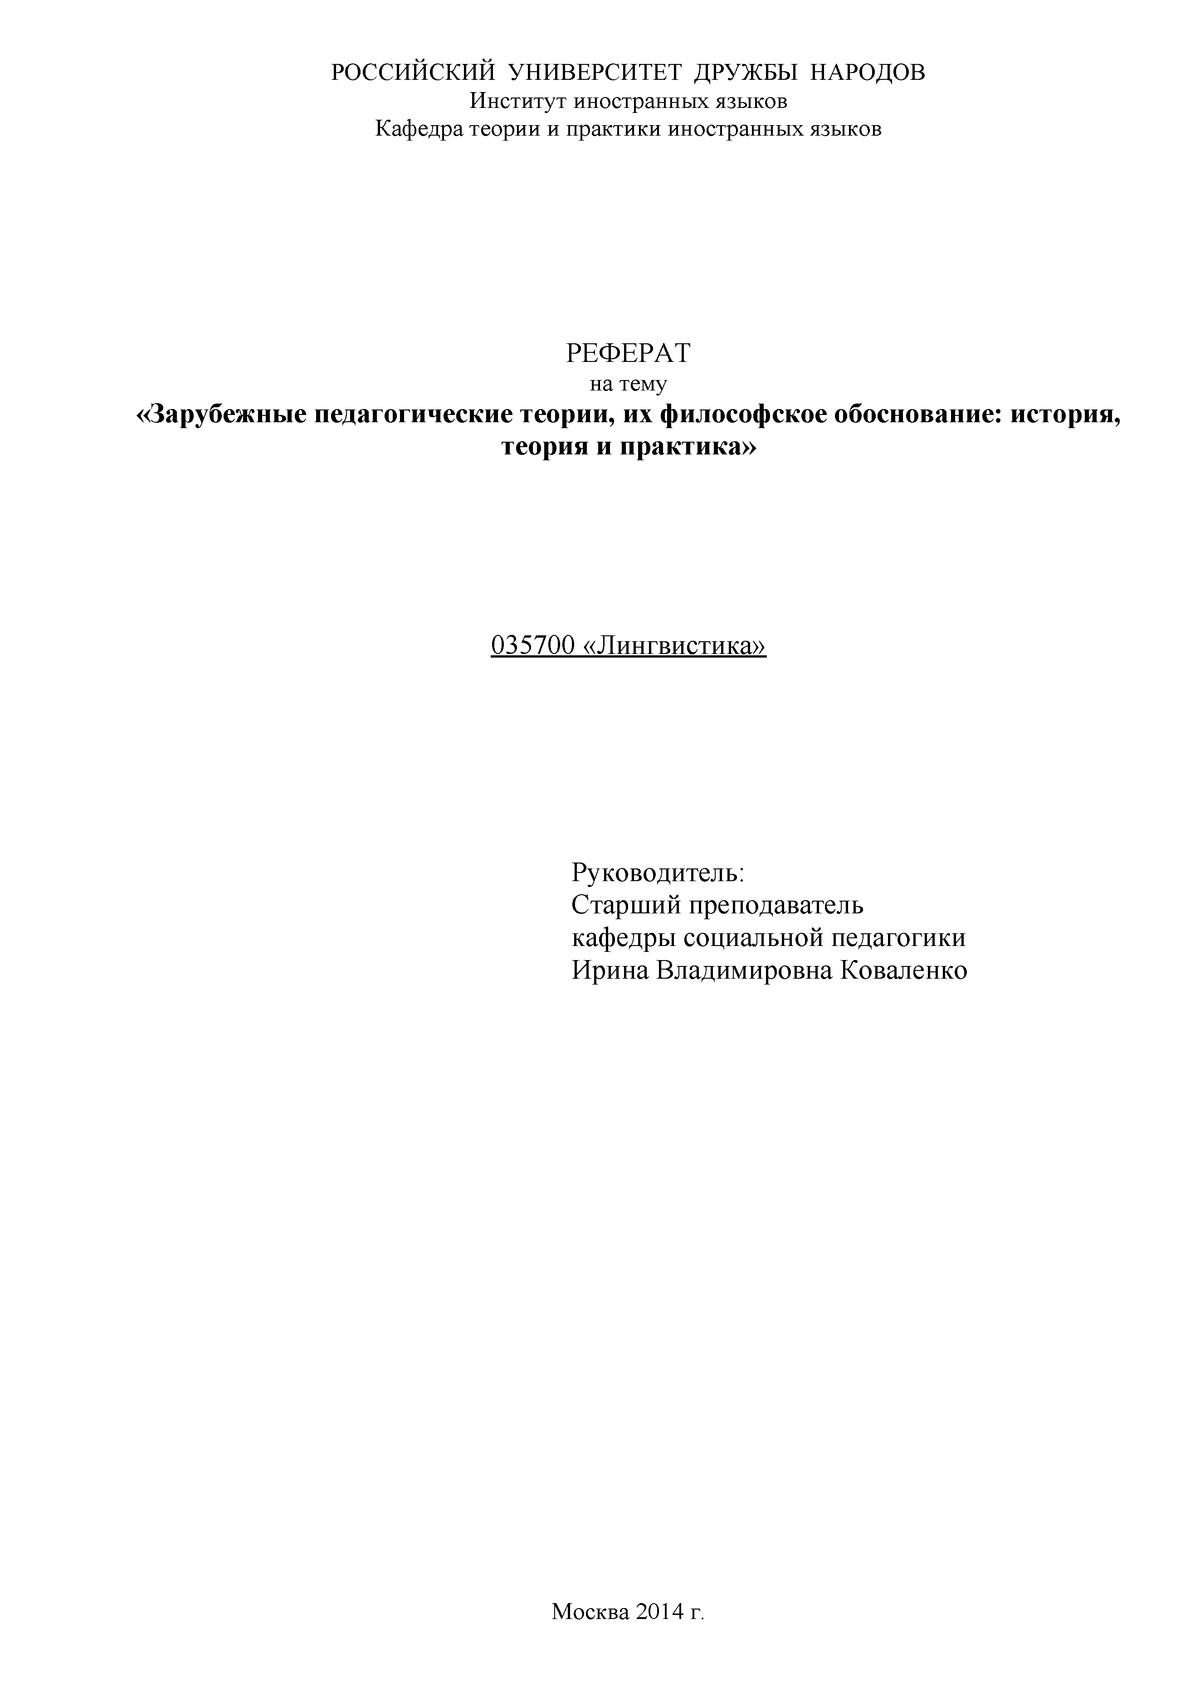 Место педагогики в системе наук реферат 1216